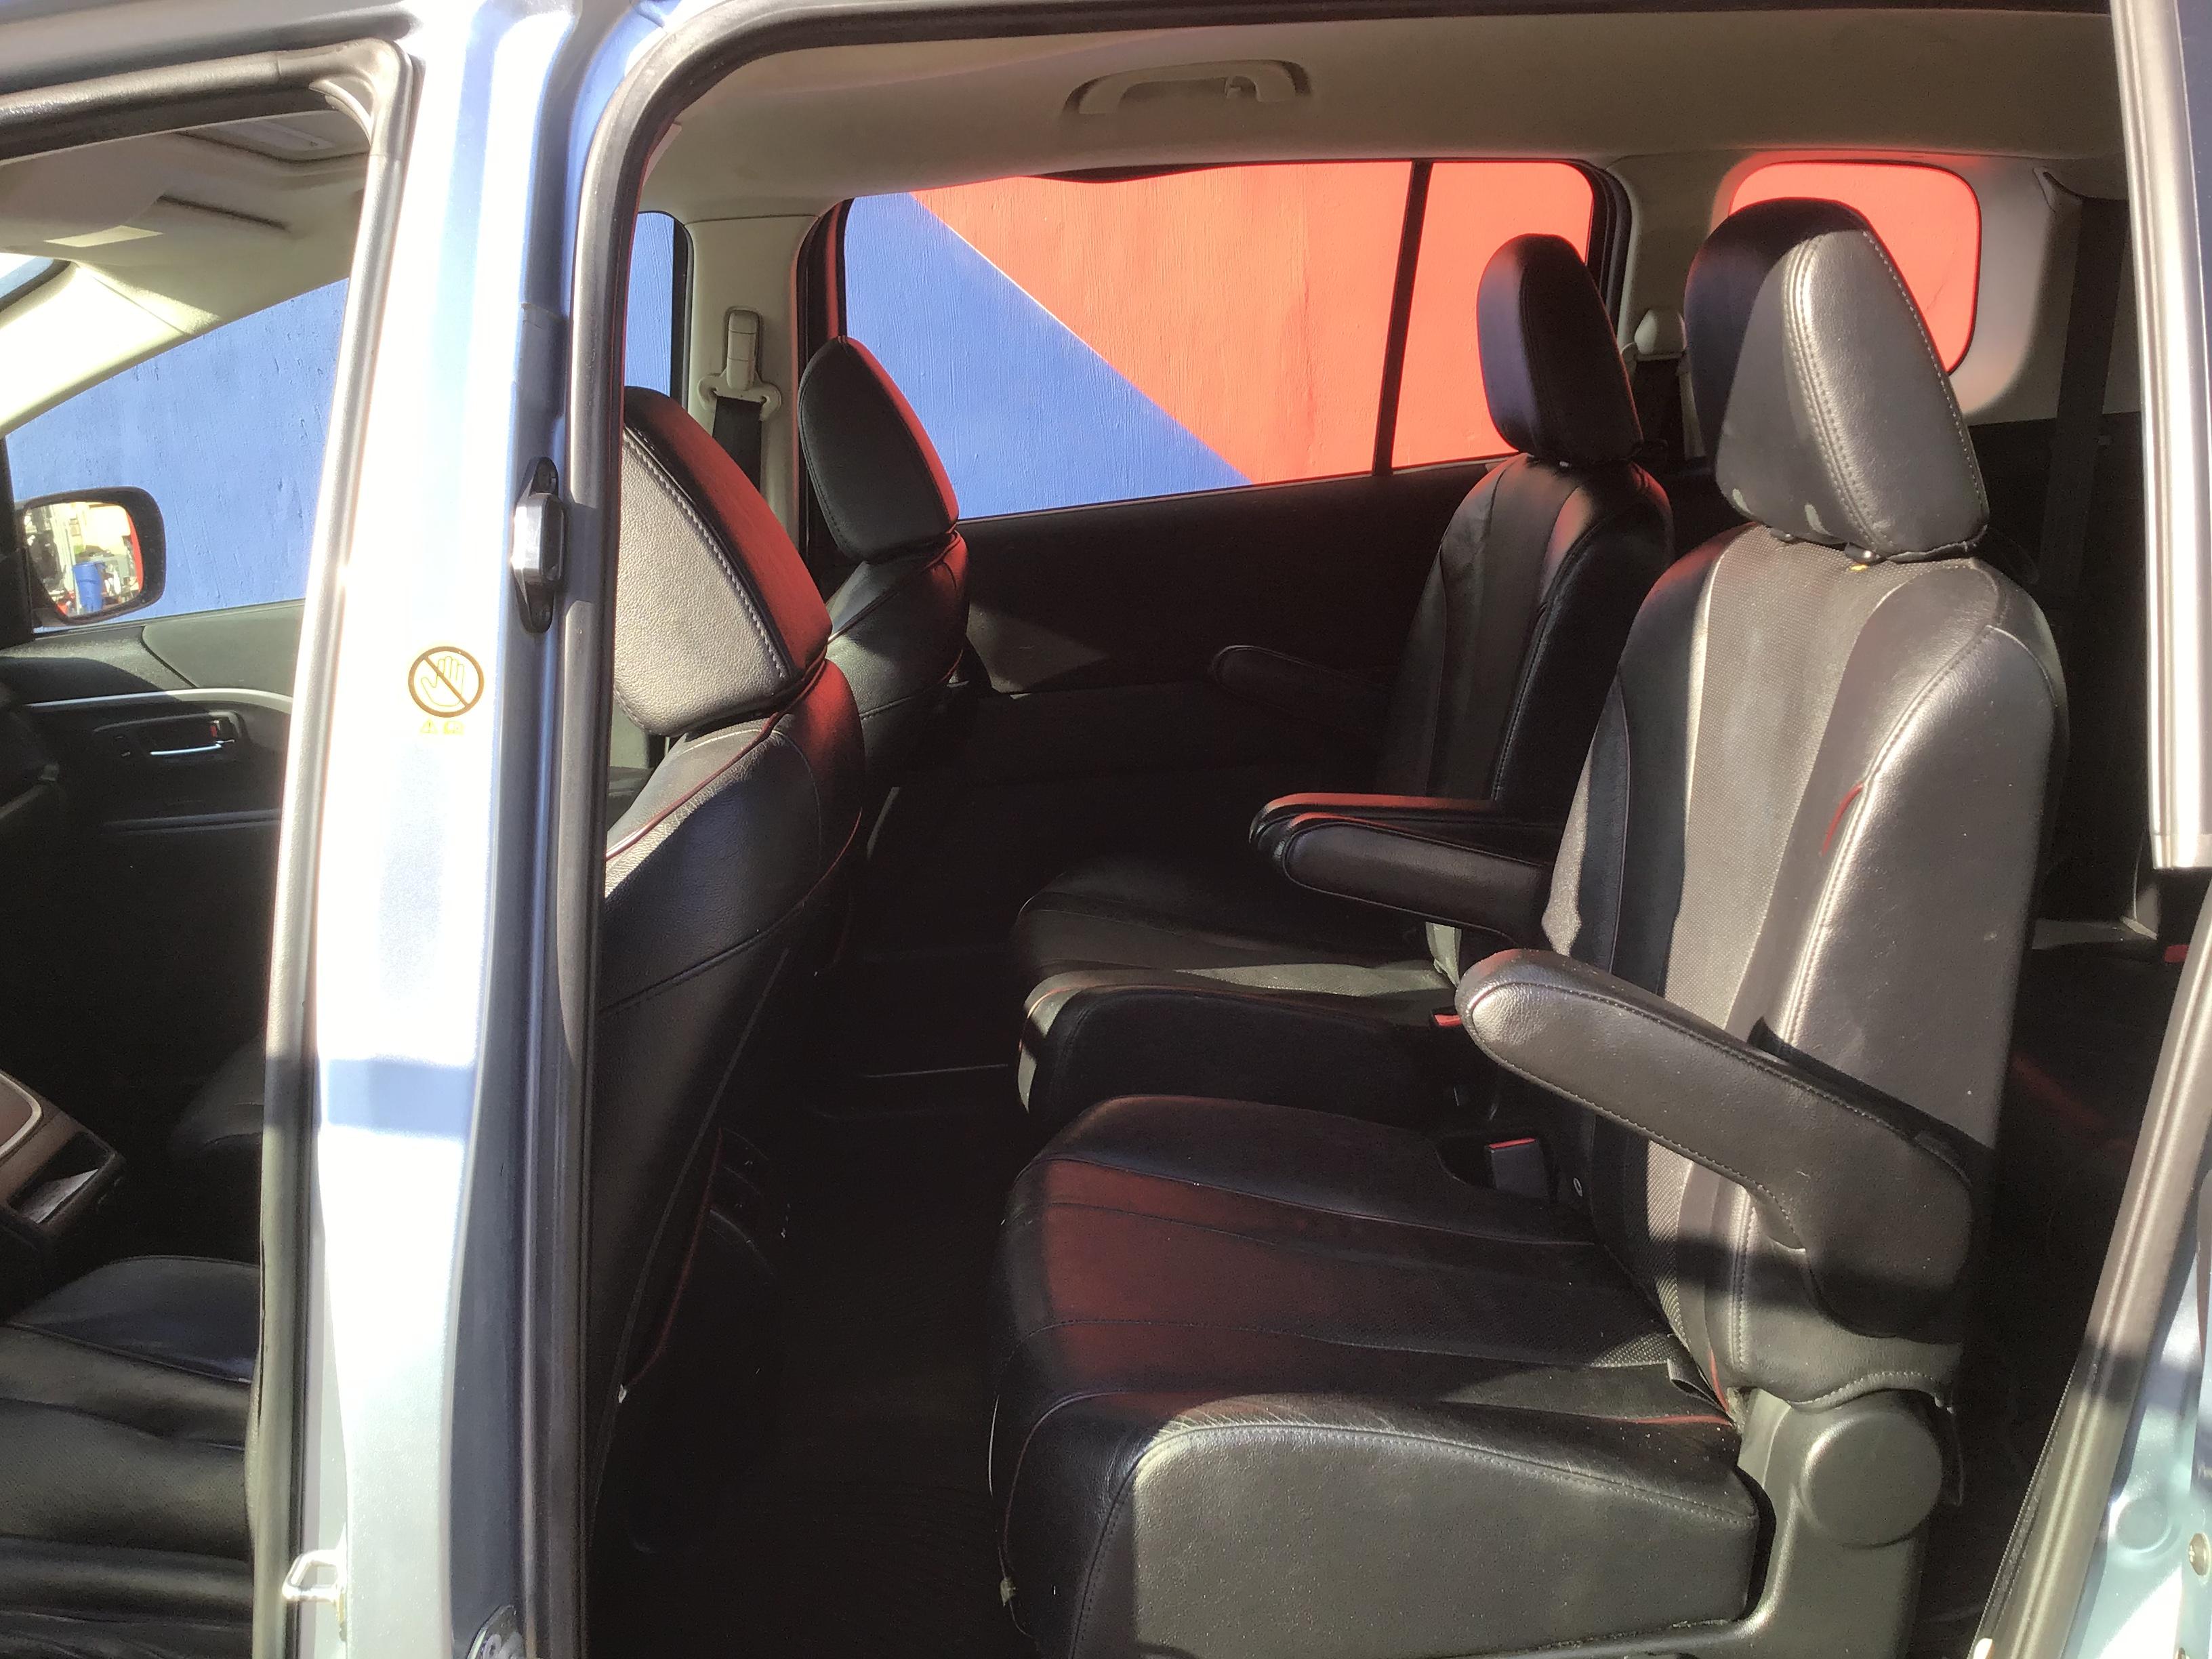 used vehicle - Passenger Van MAZDA MAZDA5 2013